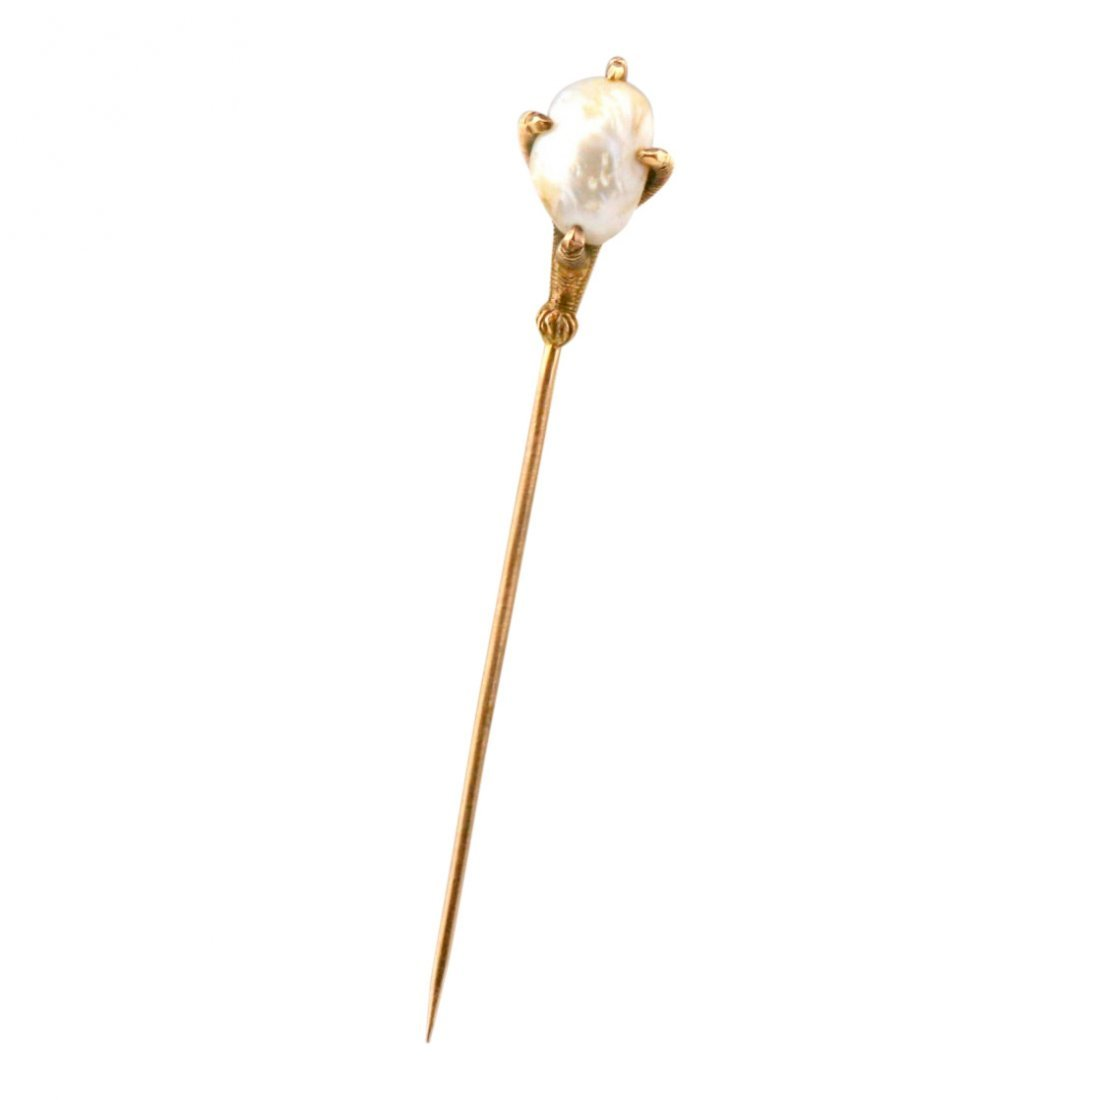 Antique Victorian 14K Gold River Pearl Stick Pin